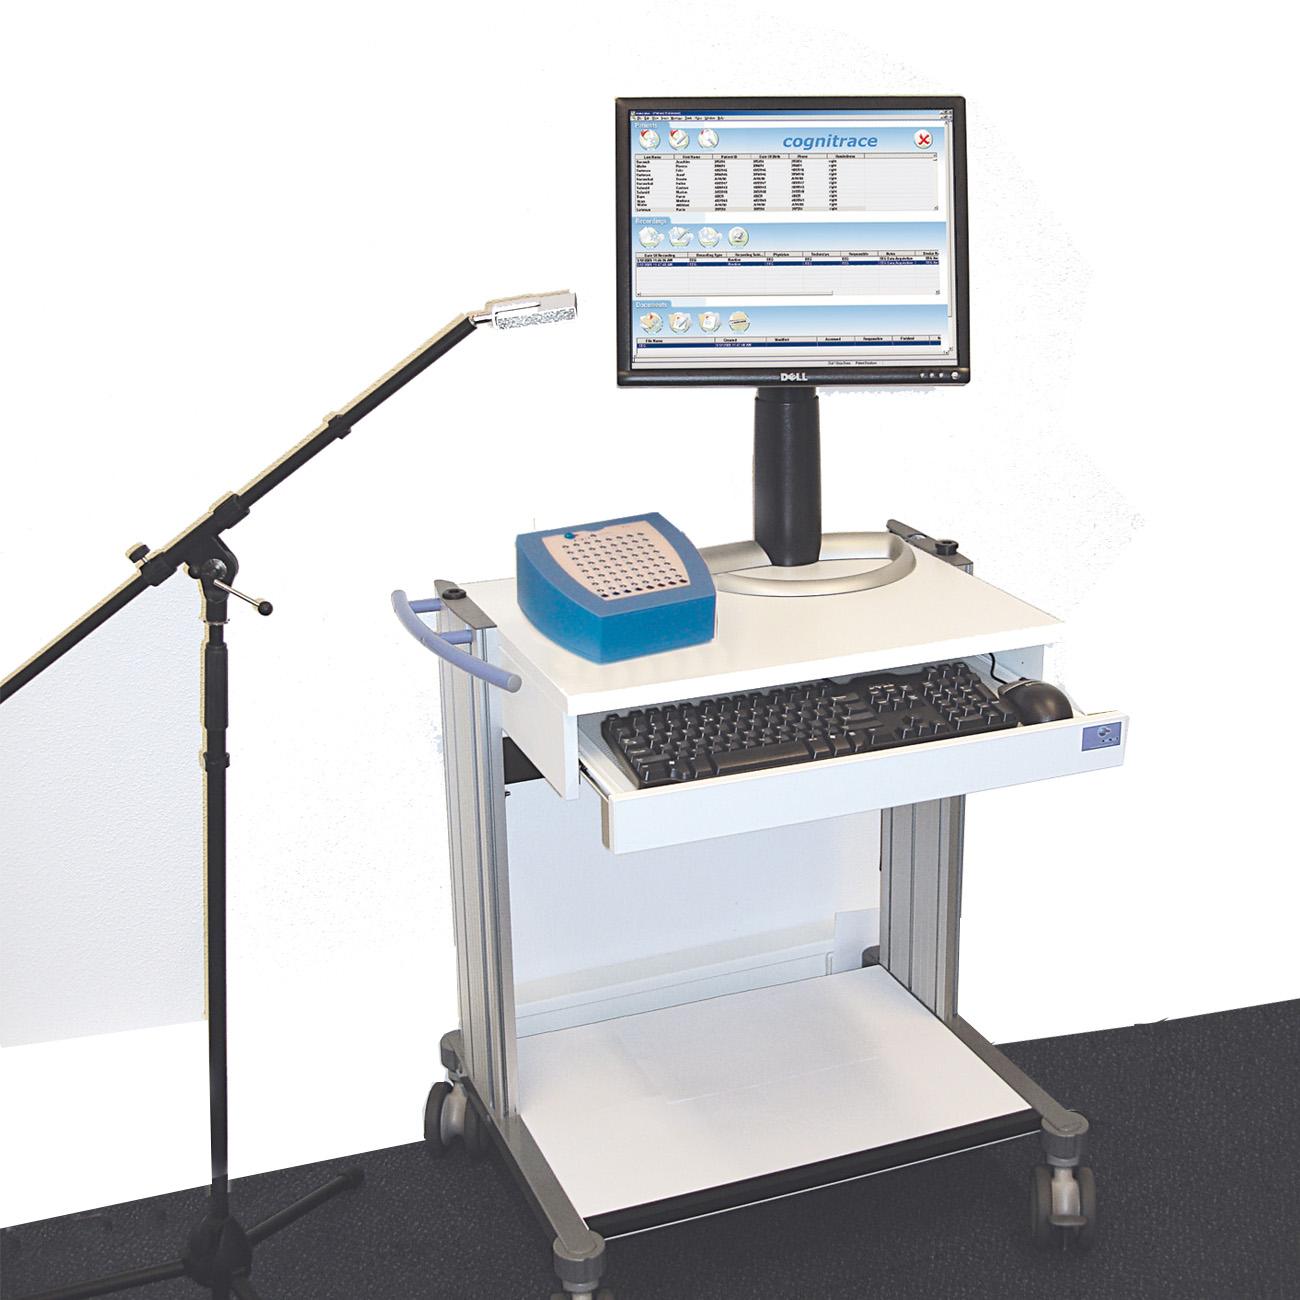 cognitrace system including visual stimulator